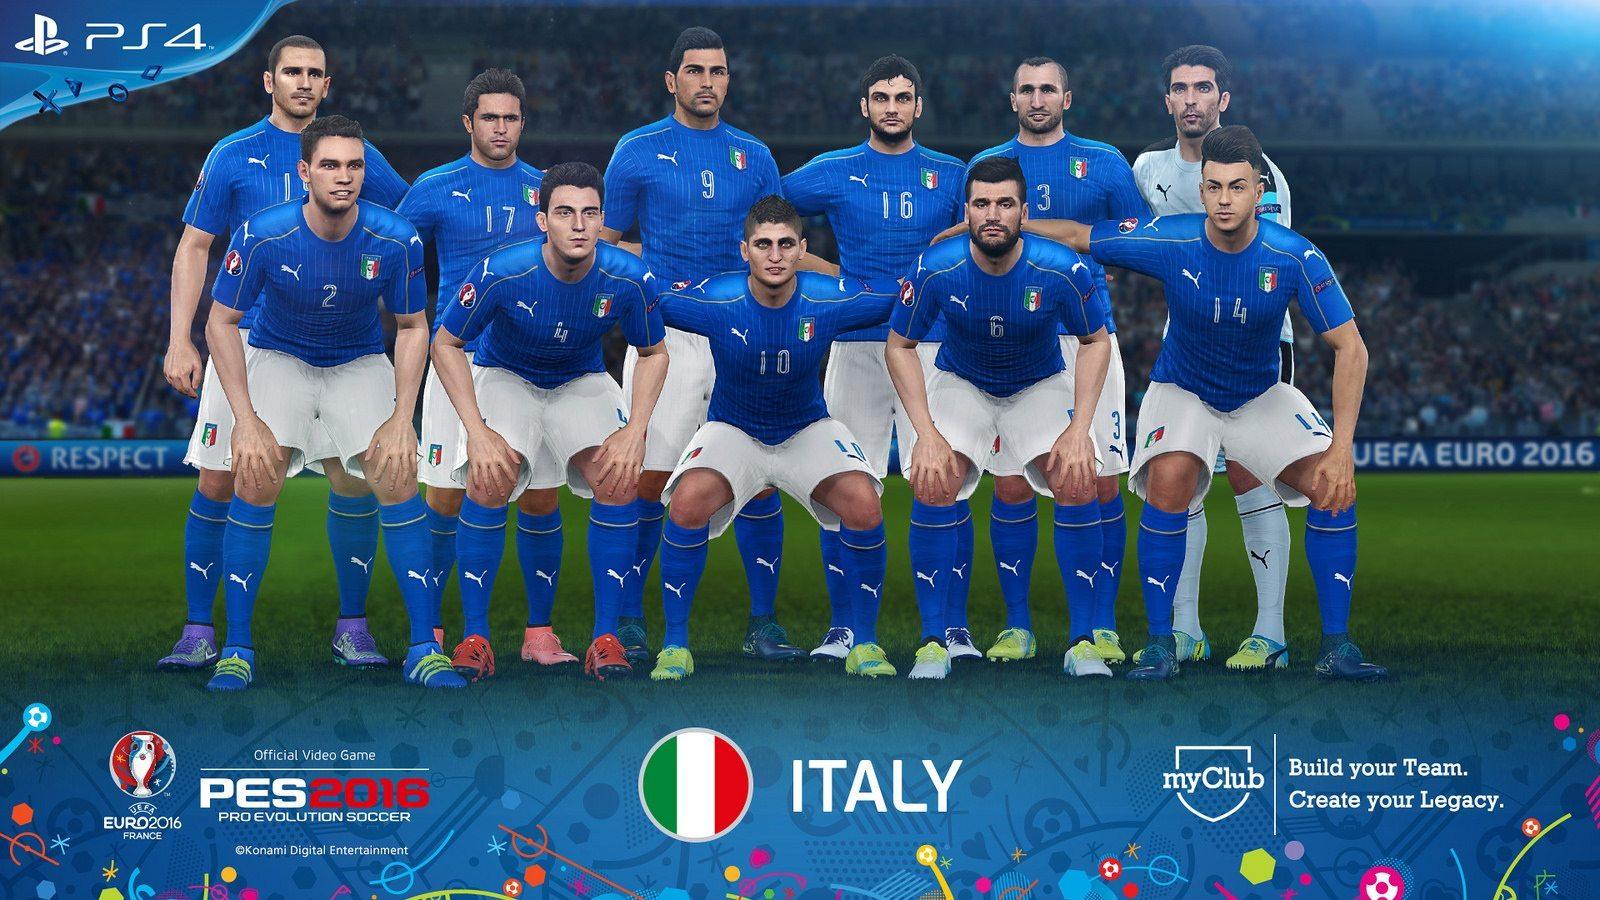 PES 2016 – UEFA Euro 2016 Italy